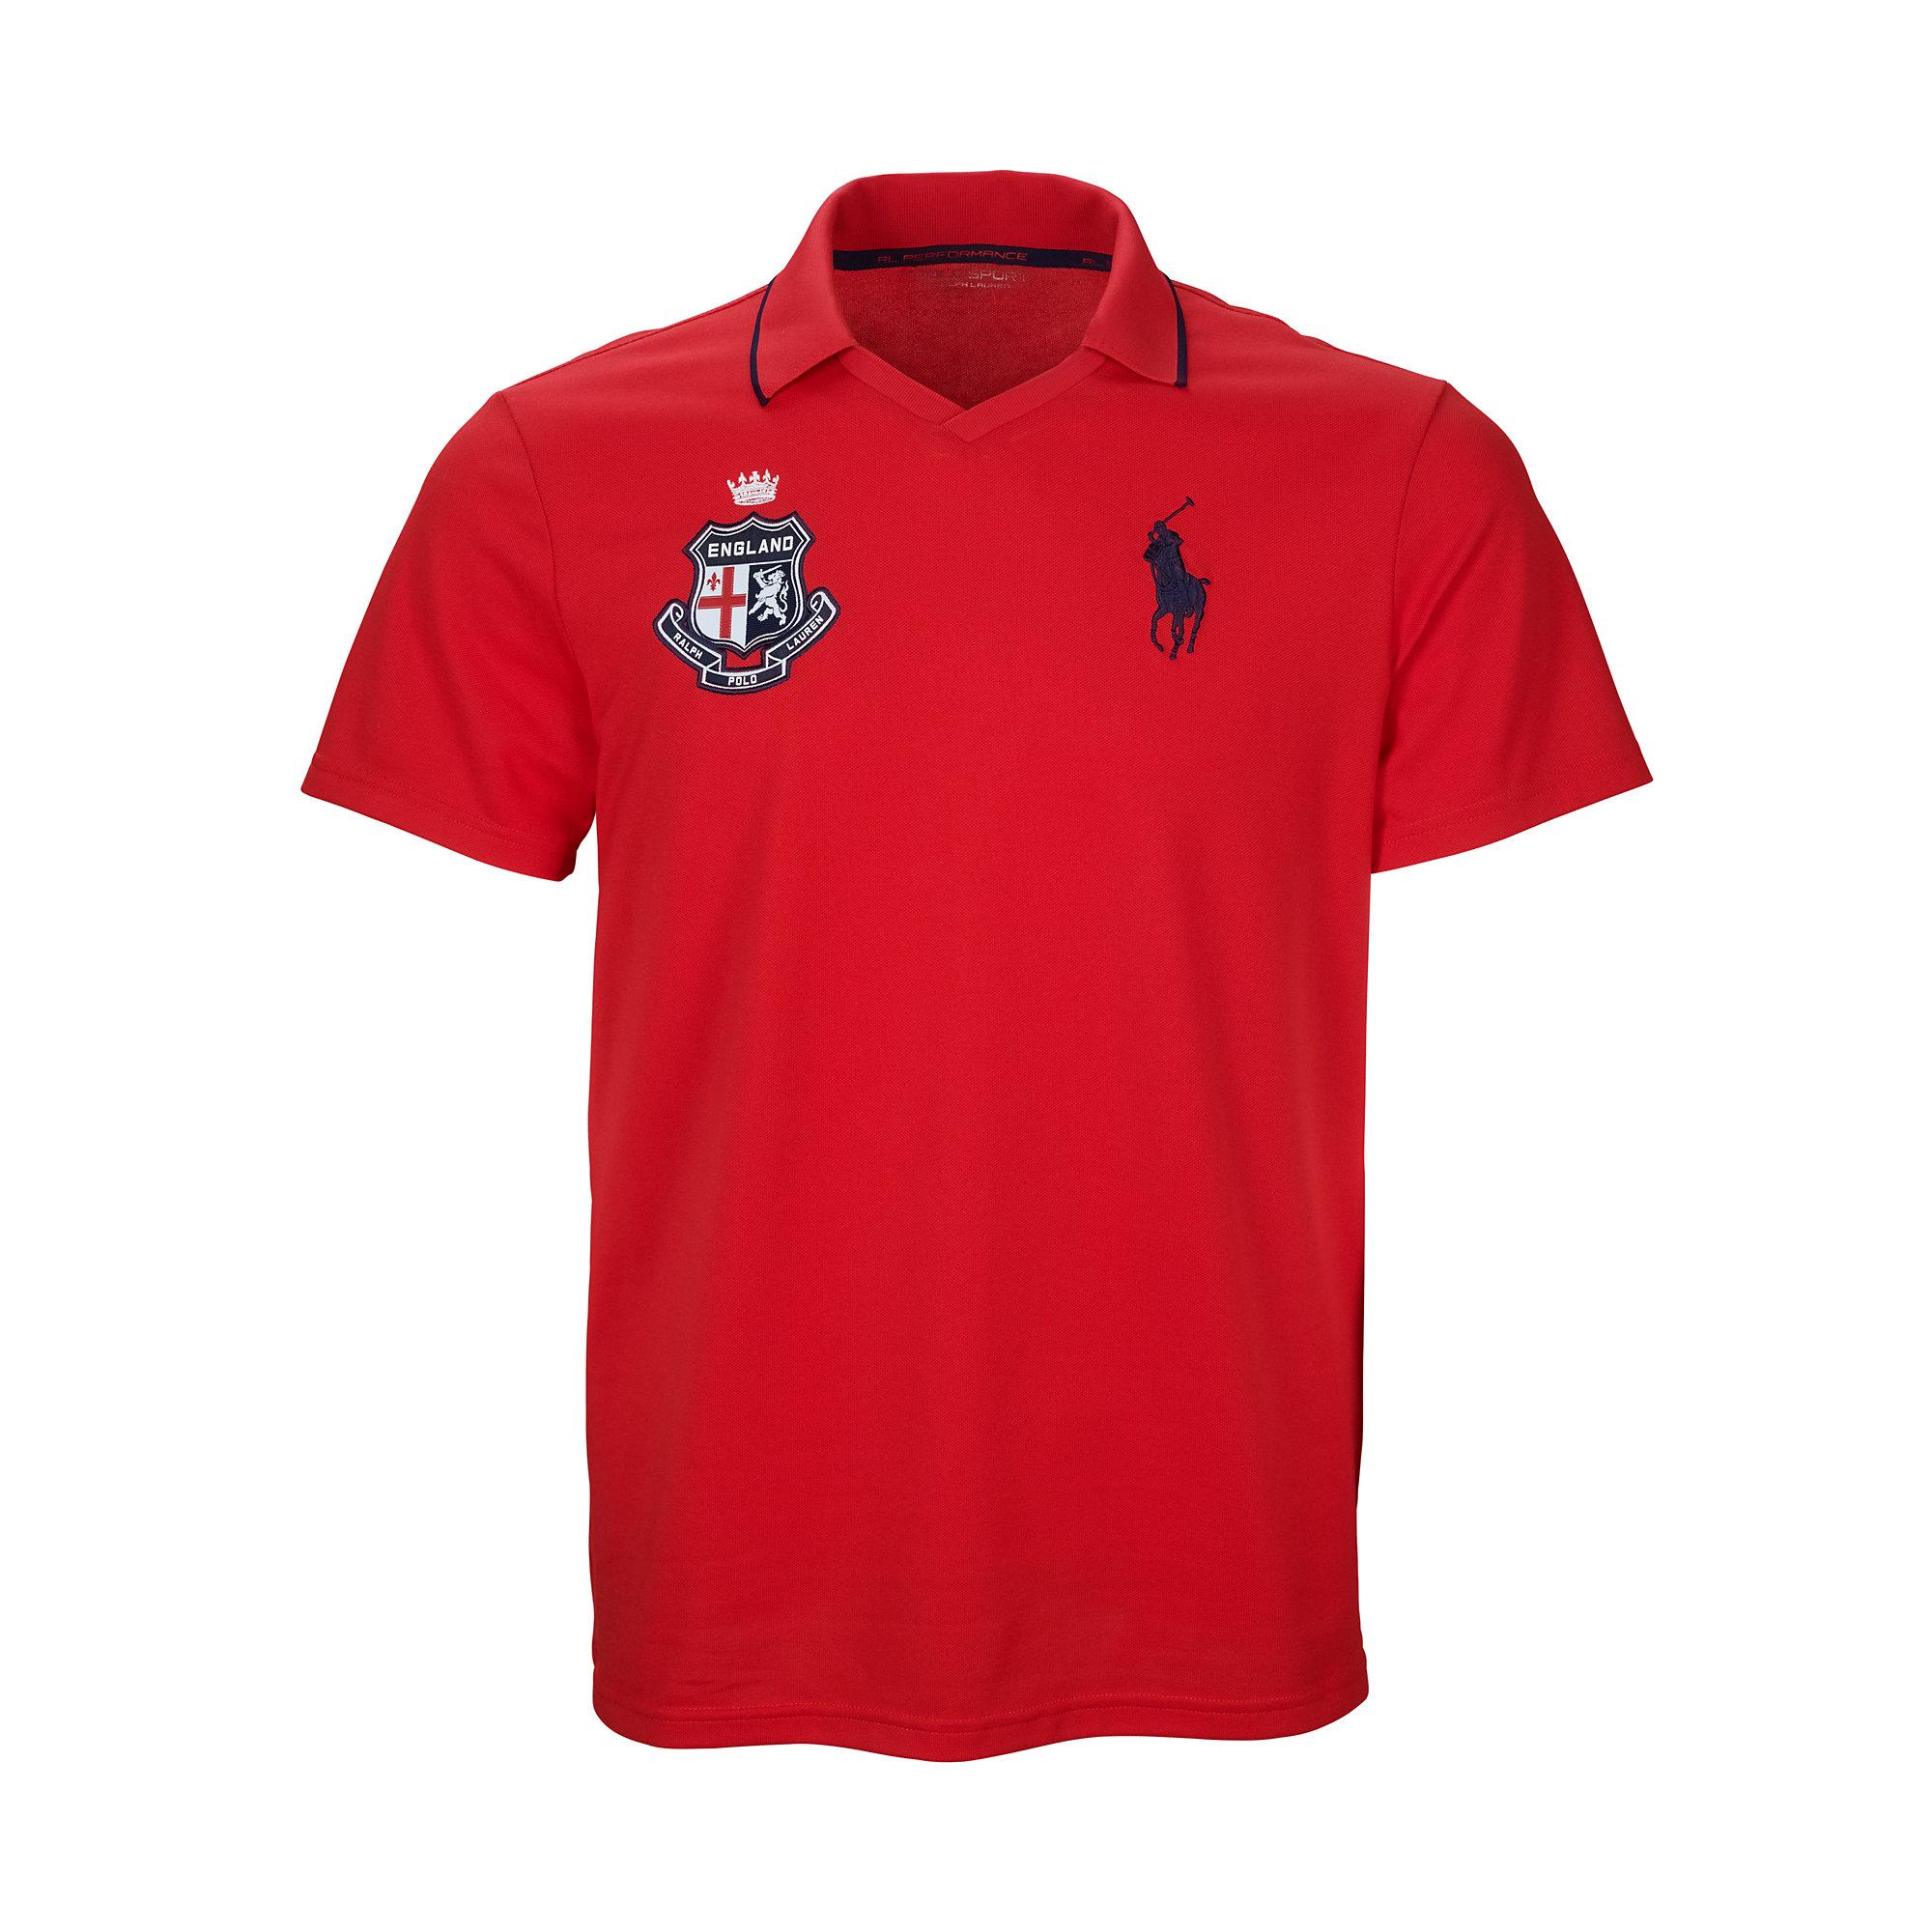 Lyst ralph lauren england polo shirt in red for men for Ralph lauren polo shirts uk